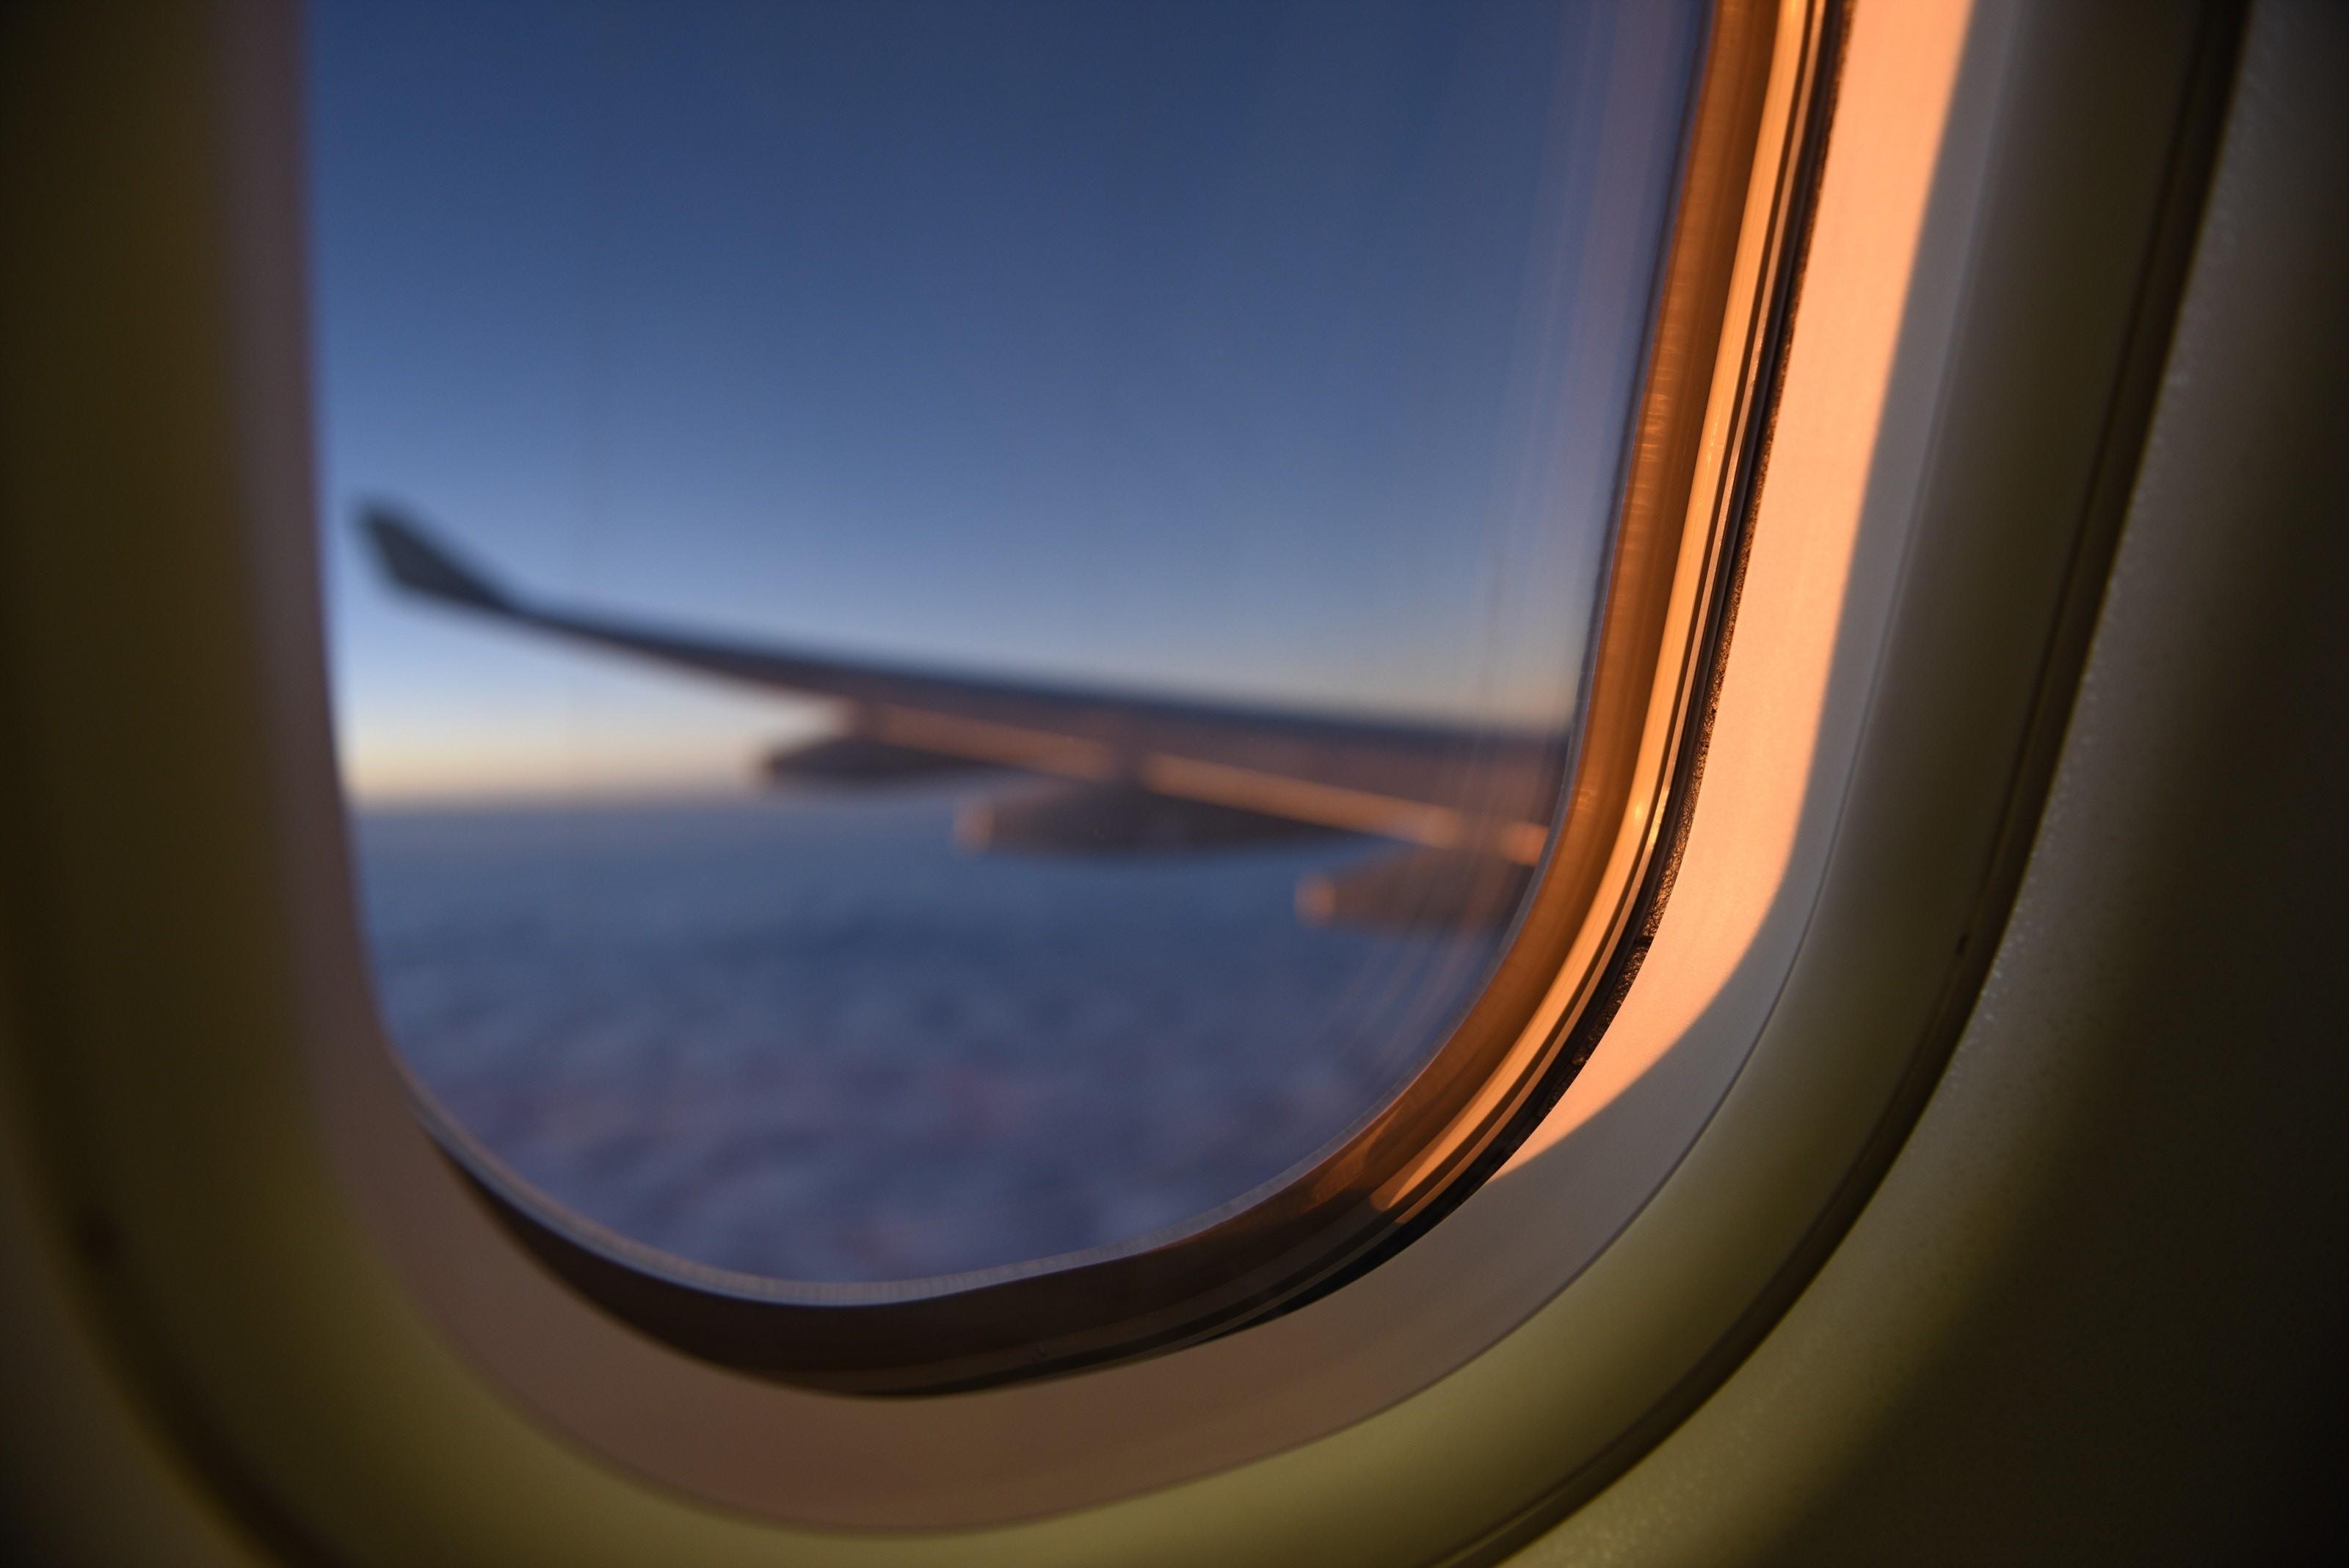 Image of airplane window